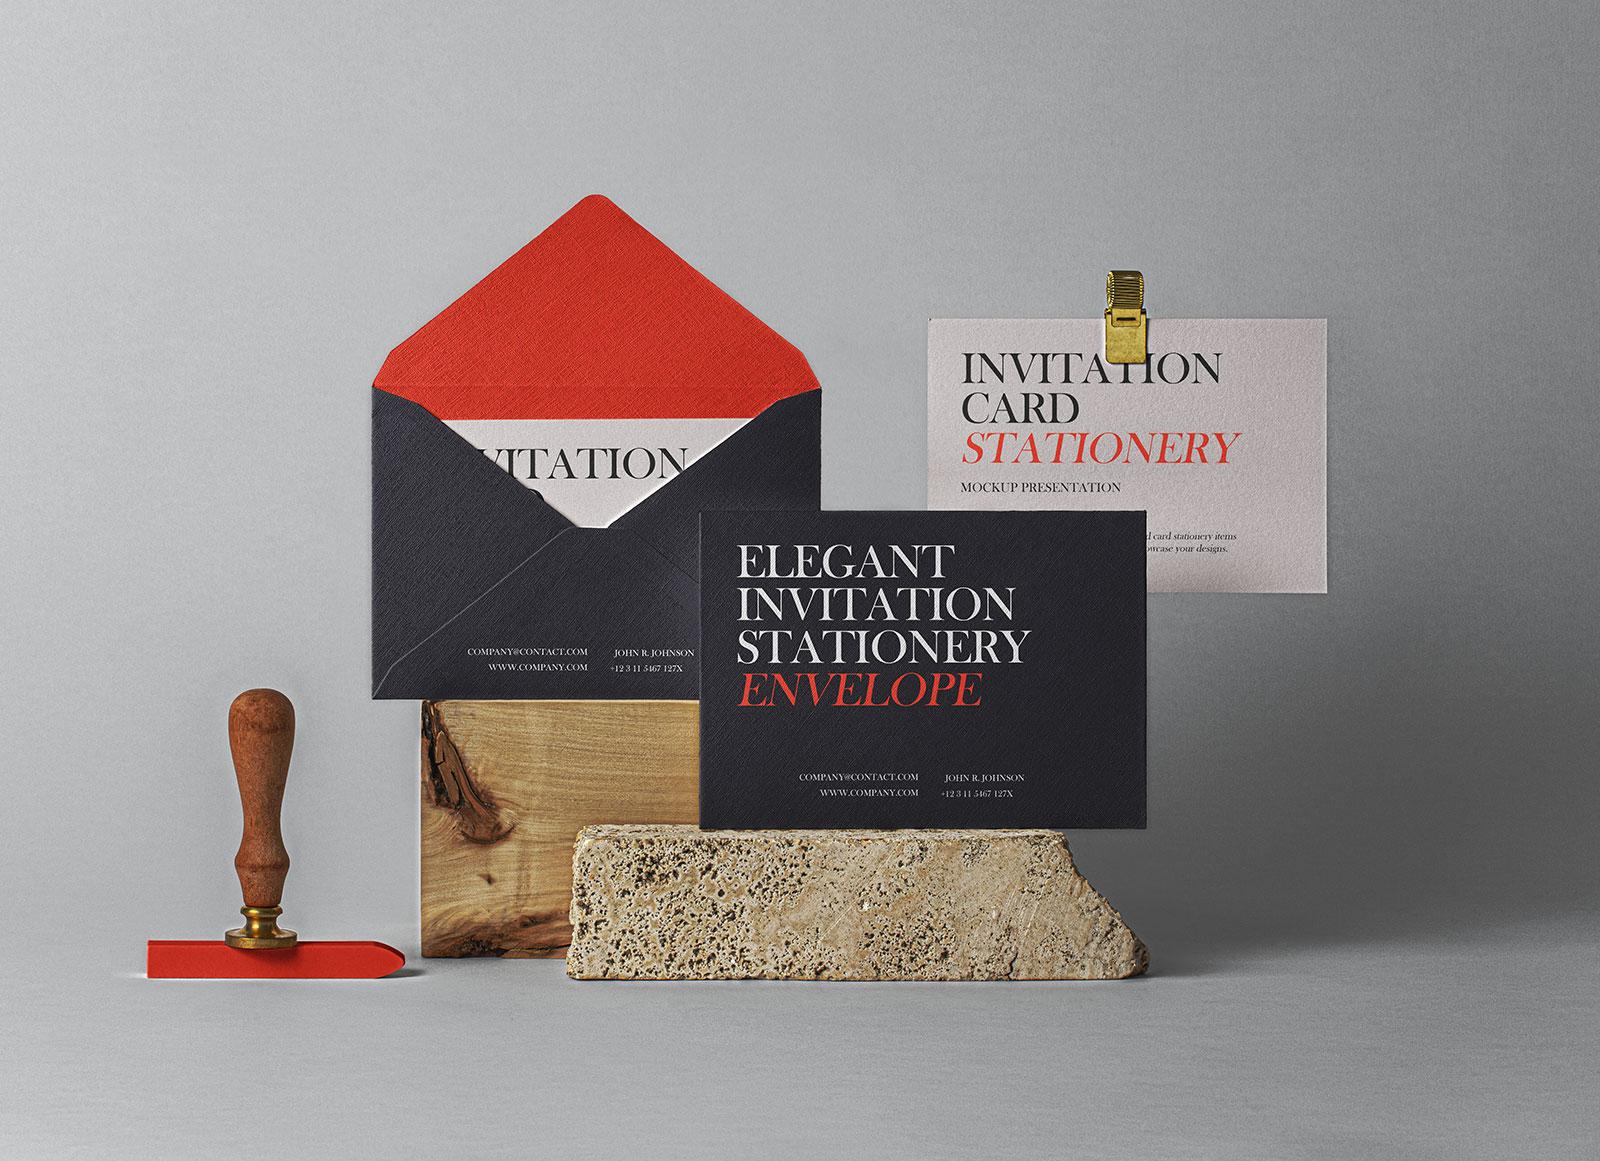 Free-Invitation-Card-&-Envelope-Mockup-PSD